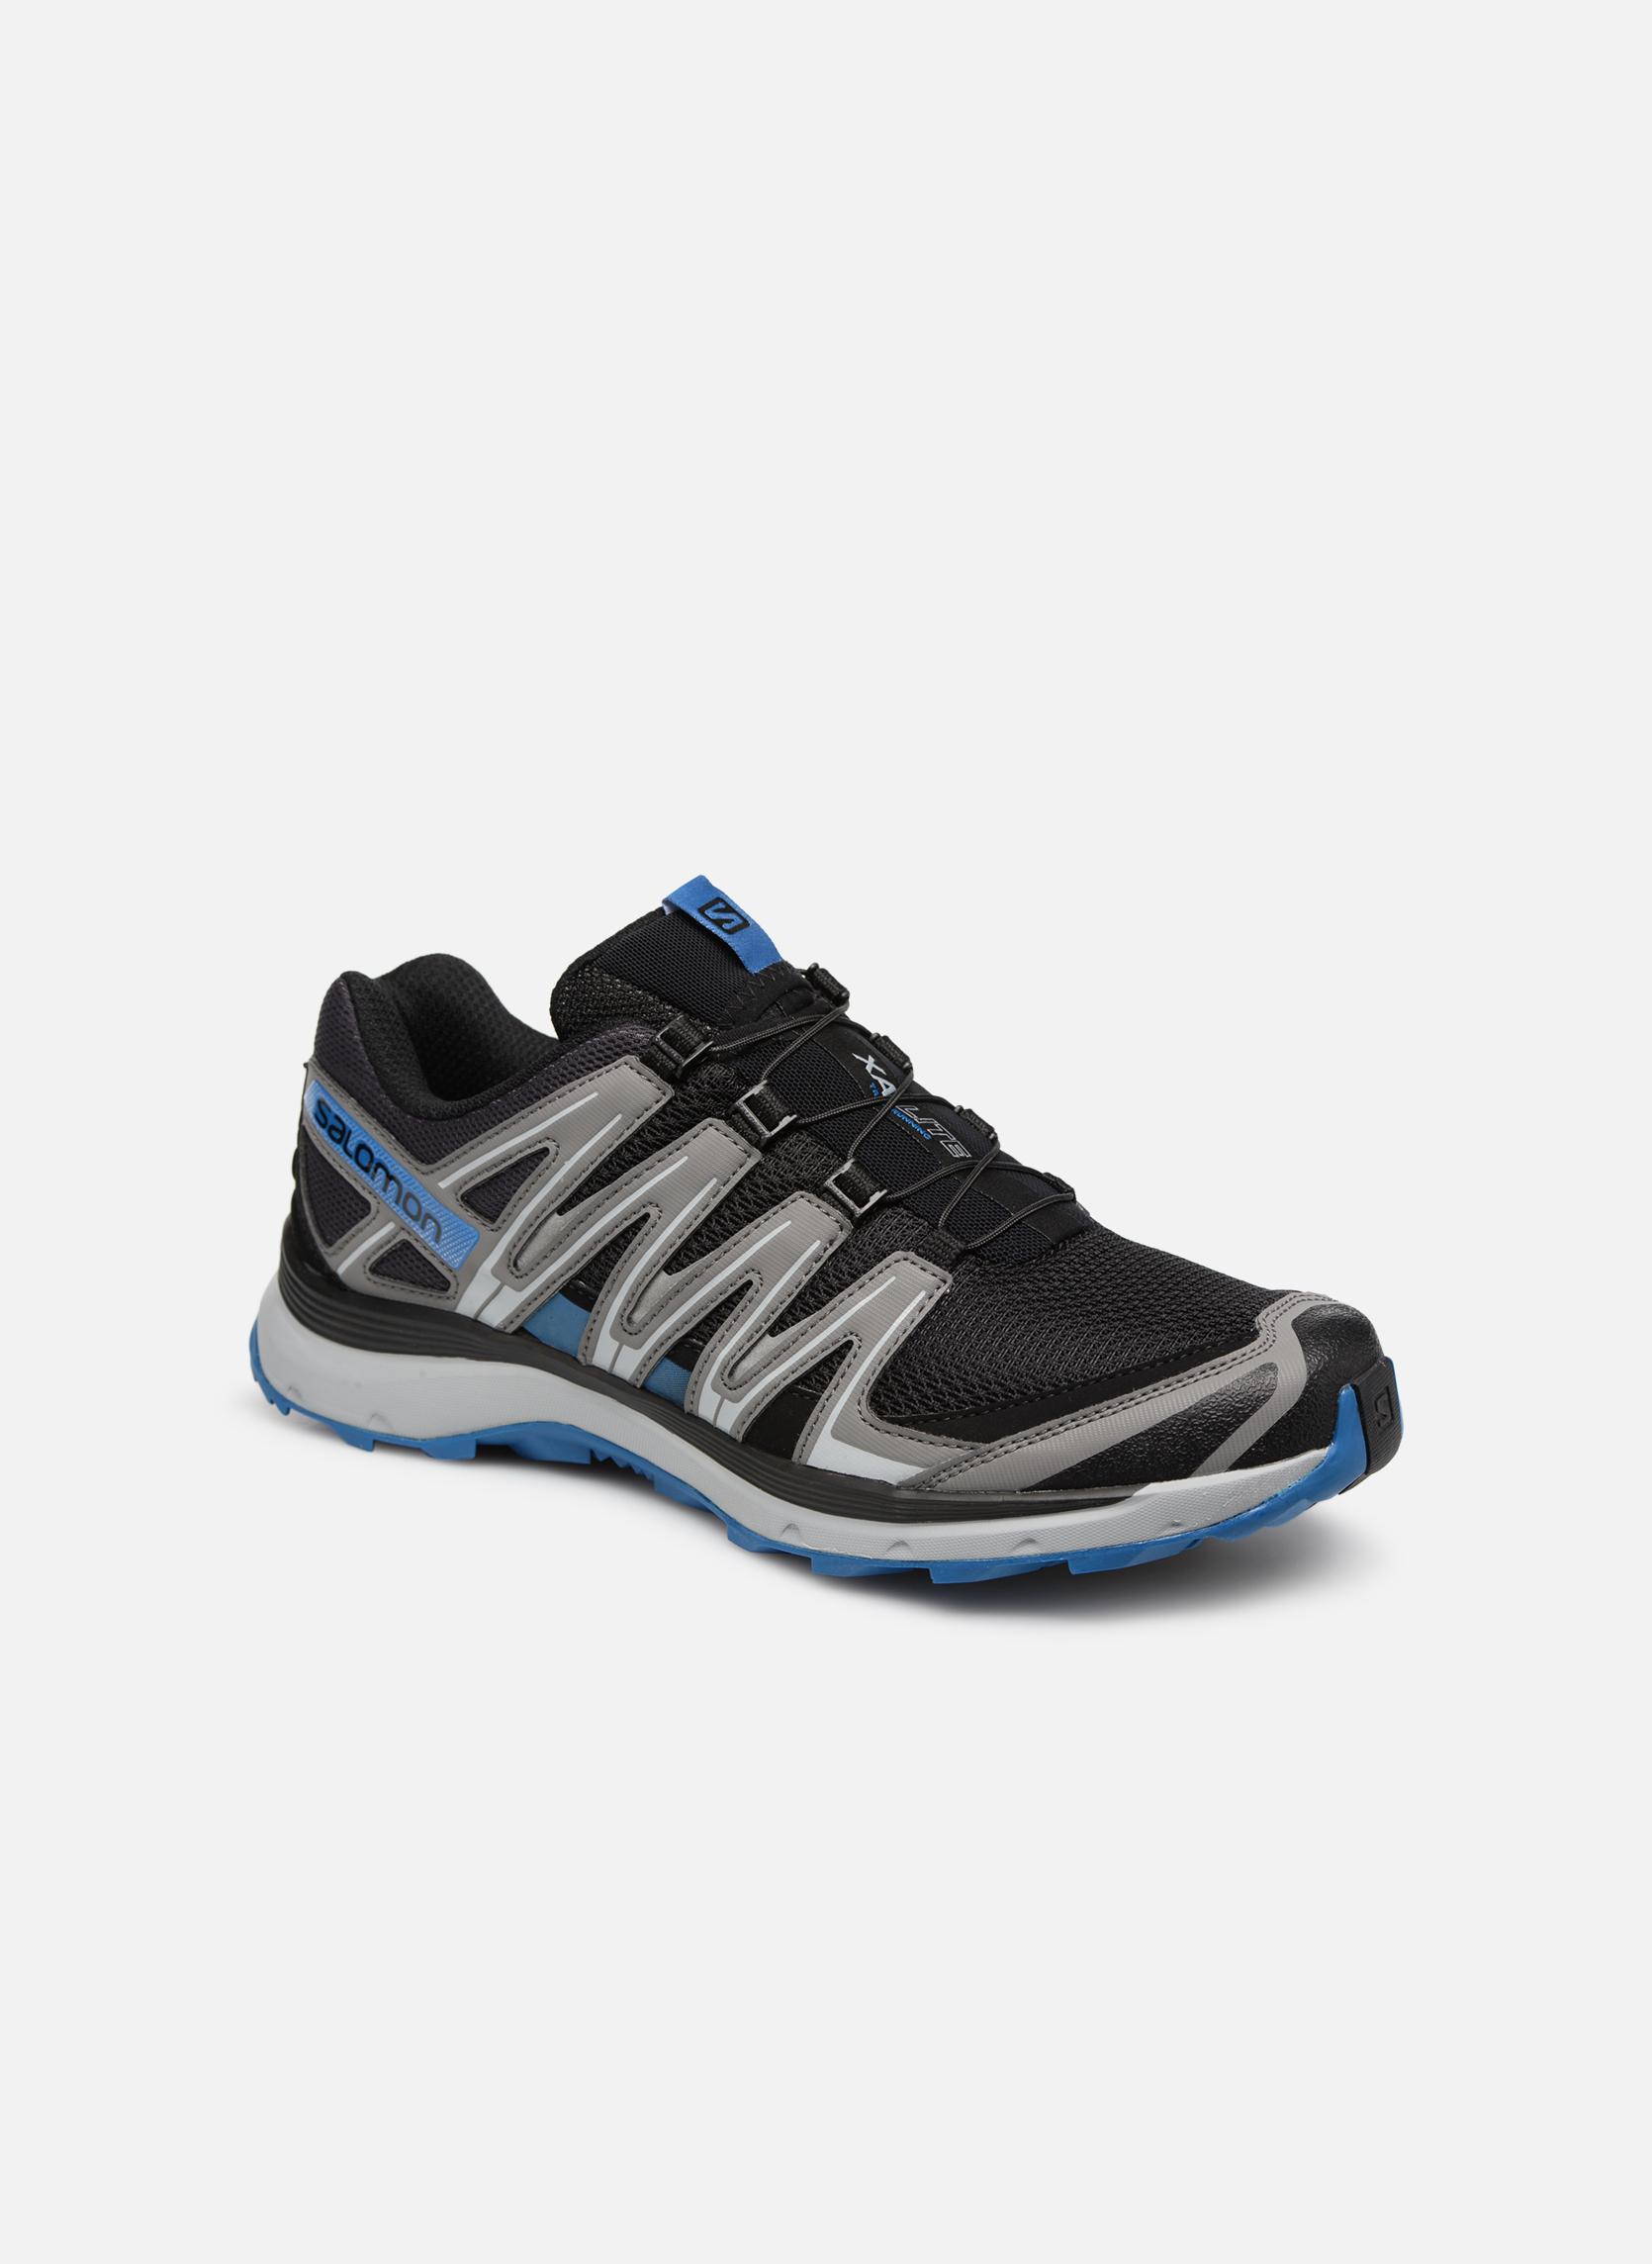 Chaussures de sport Homme Xa Lite